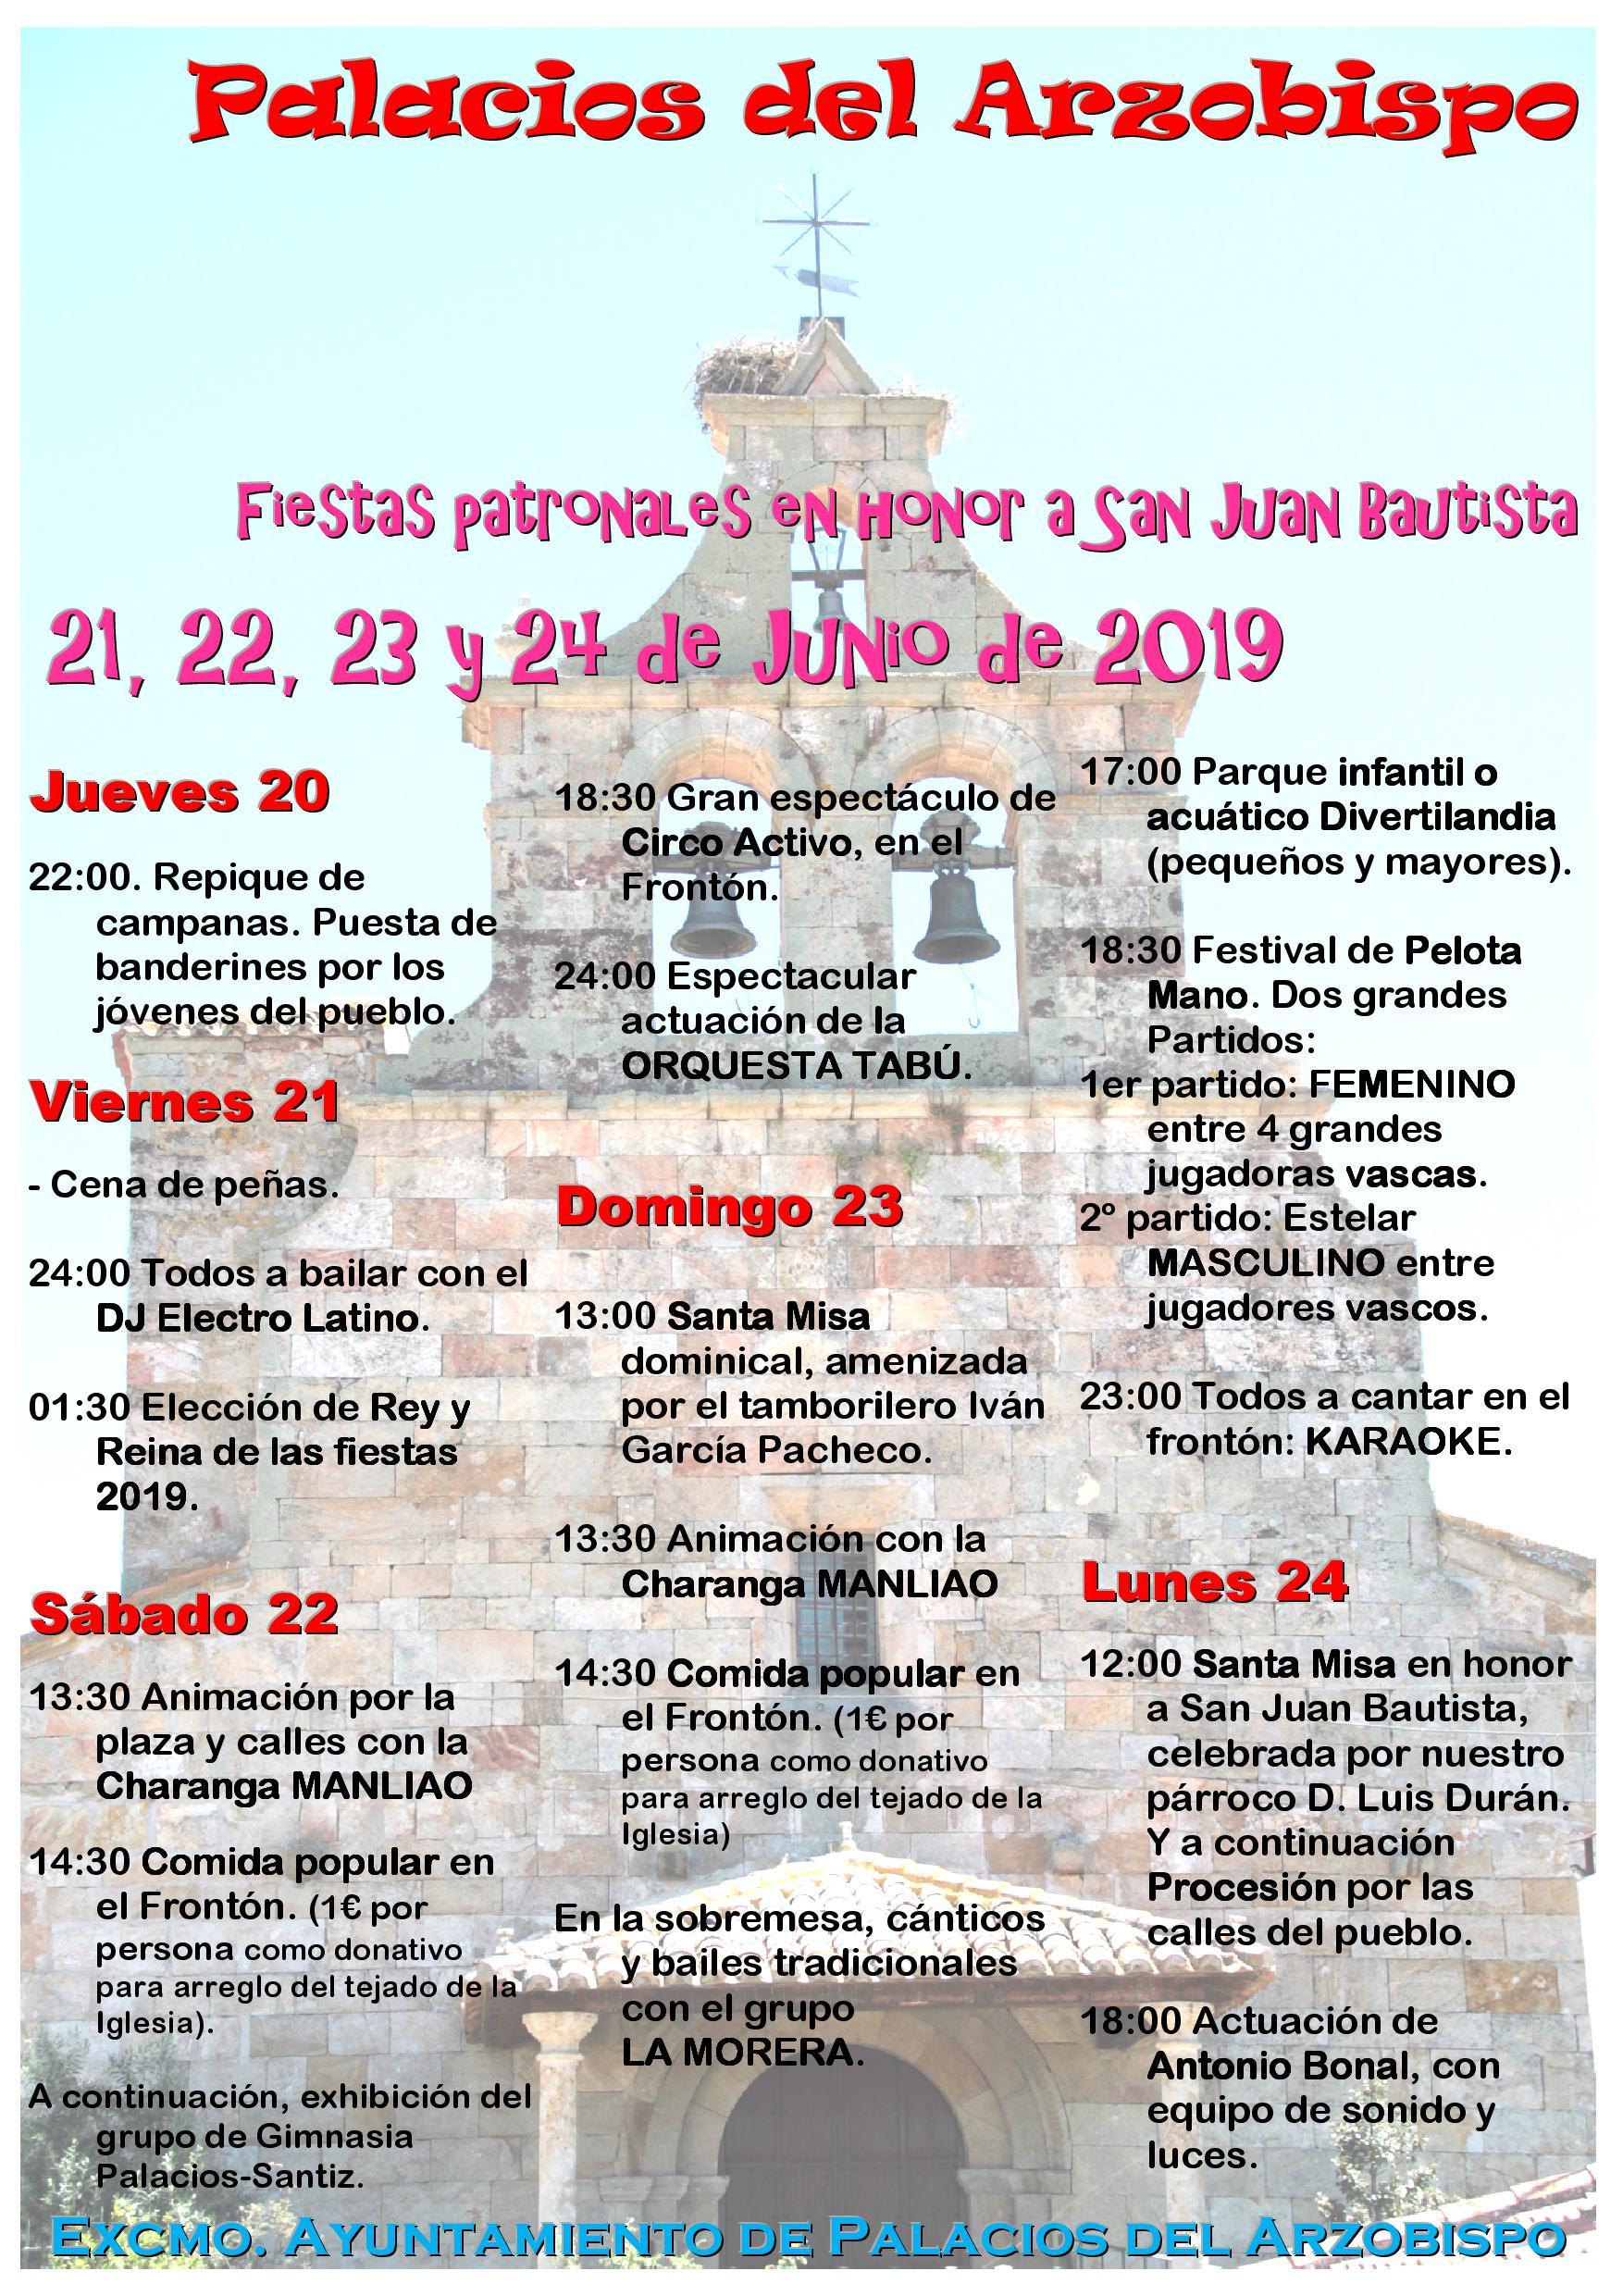 Fiestas patronales en Honor a San Juan Bautista 2019.